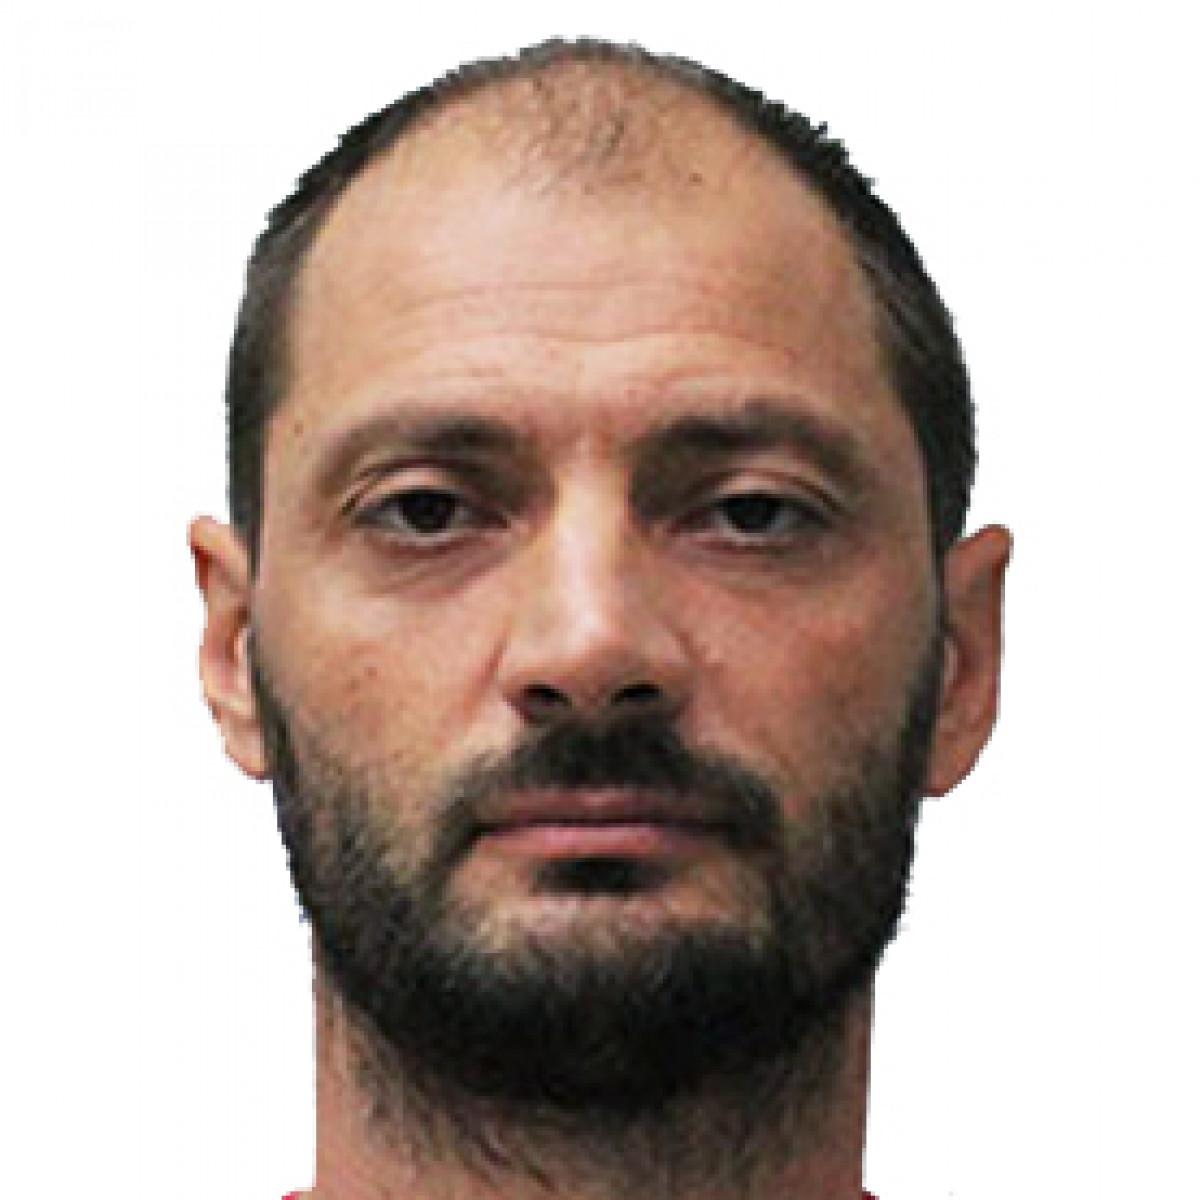 Dusan Knezevic